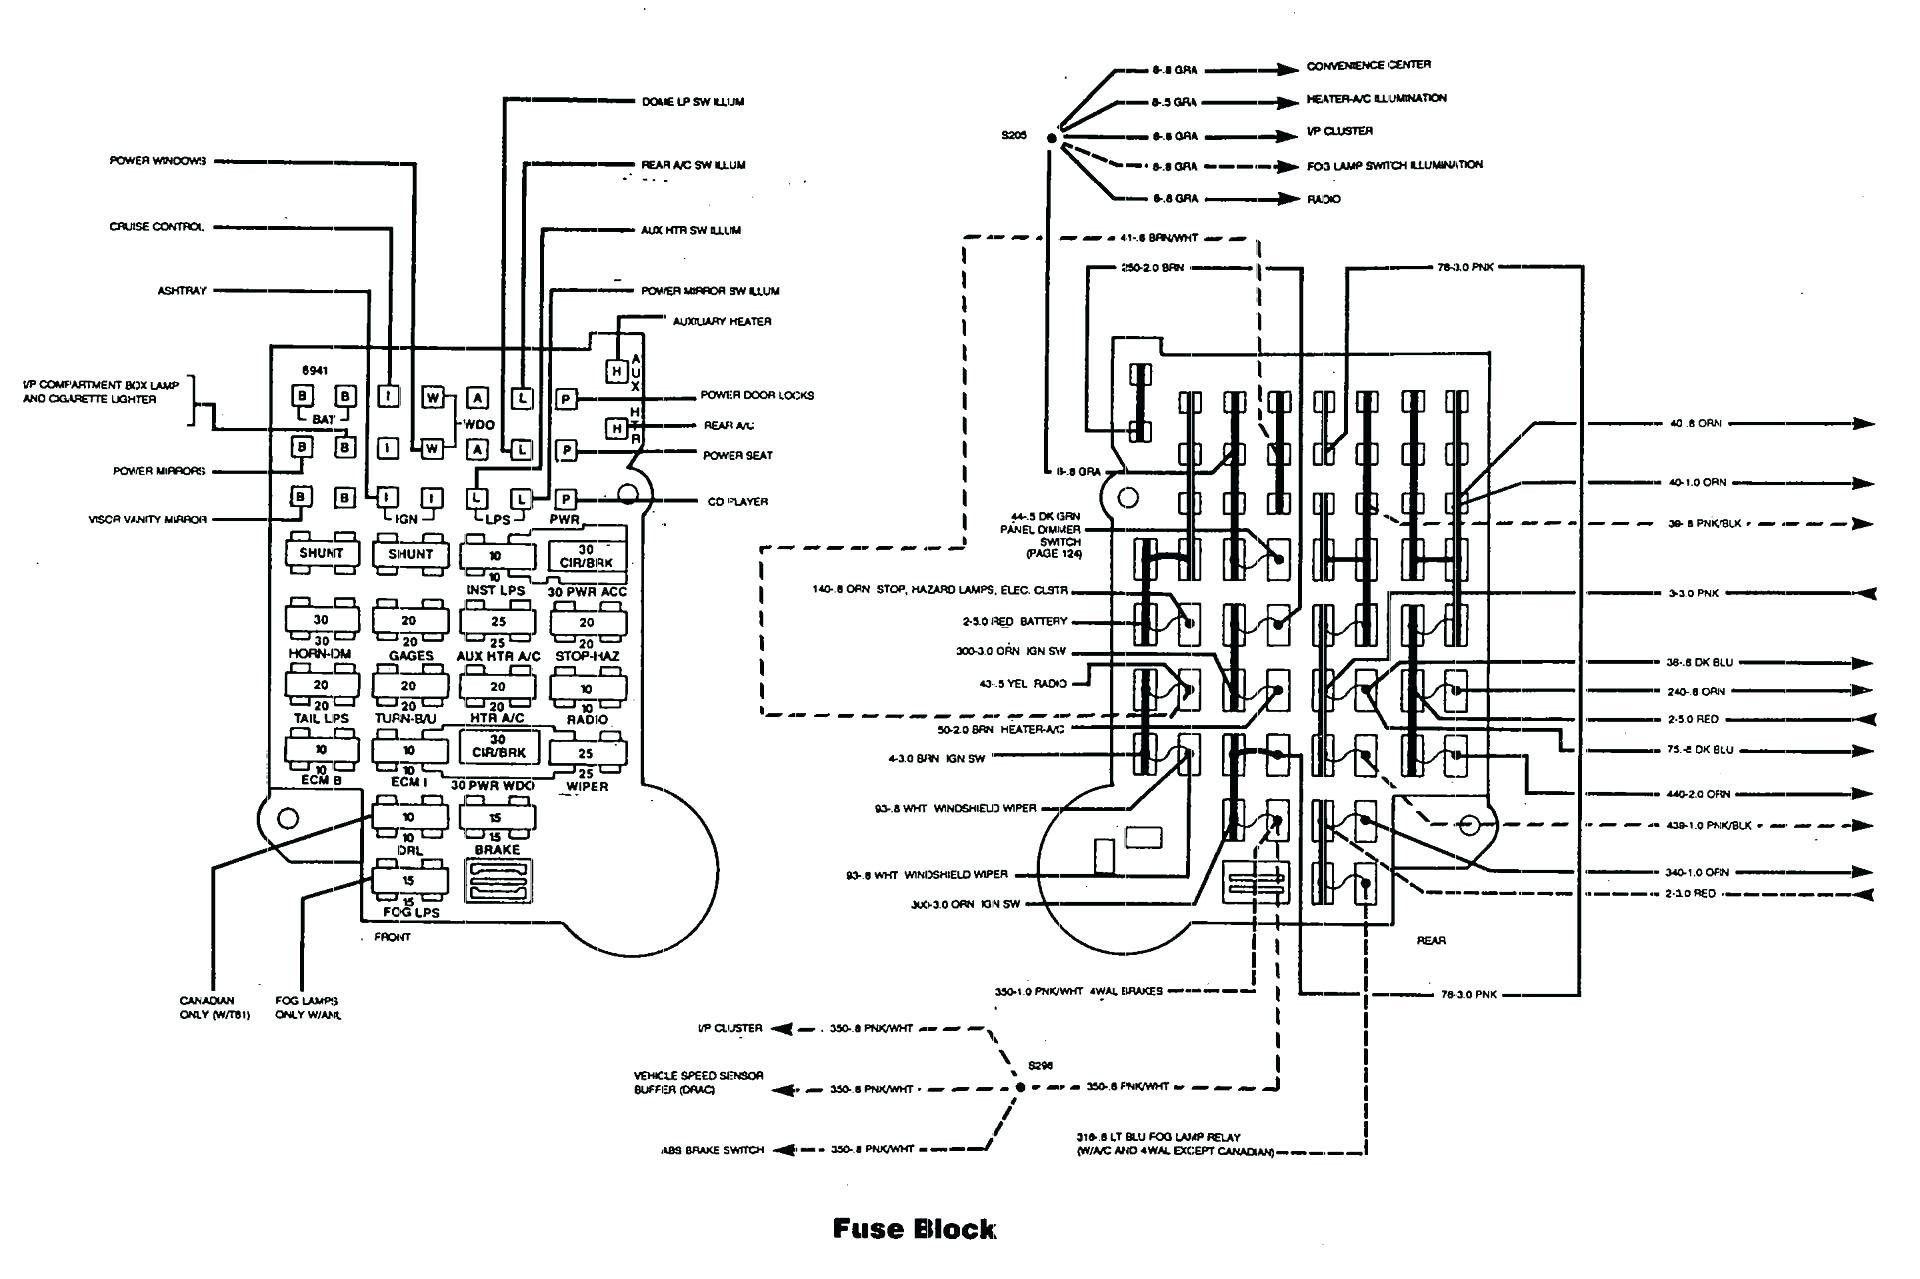 2012 jeep grand cherokee trailer wiring diagram | wiring diagram  wiring diagram